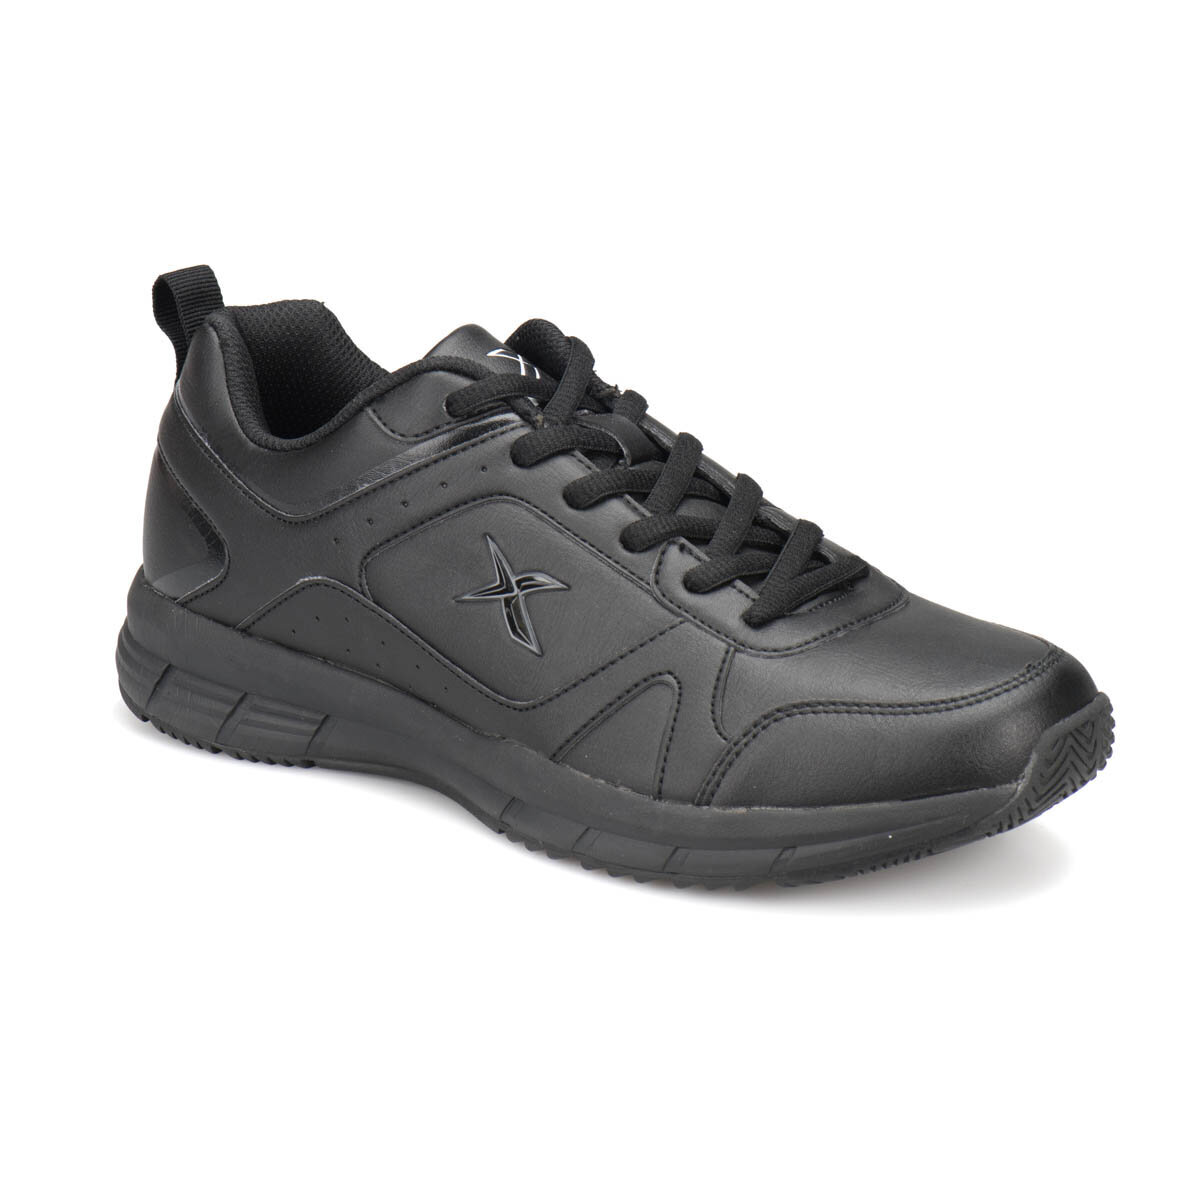 SIYAH Erkek Fitness Ayakkabısı ROBUS PU